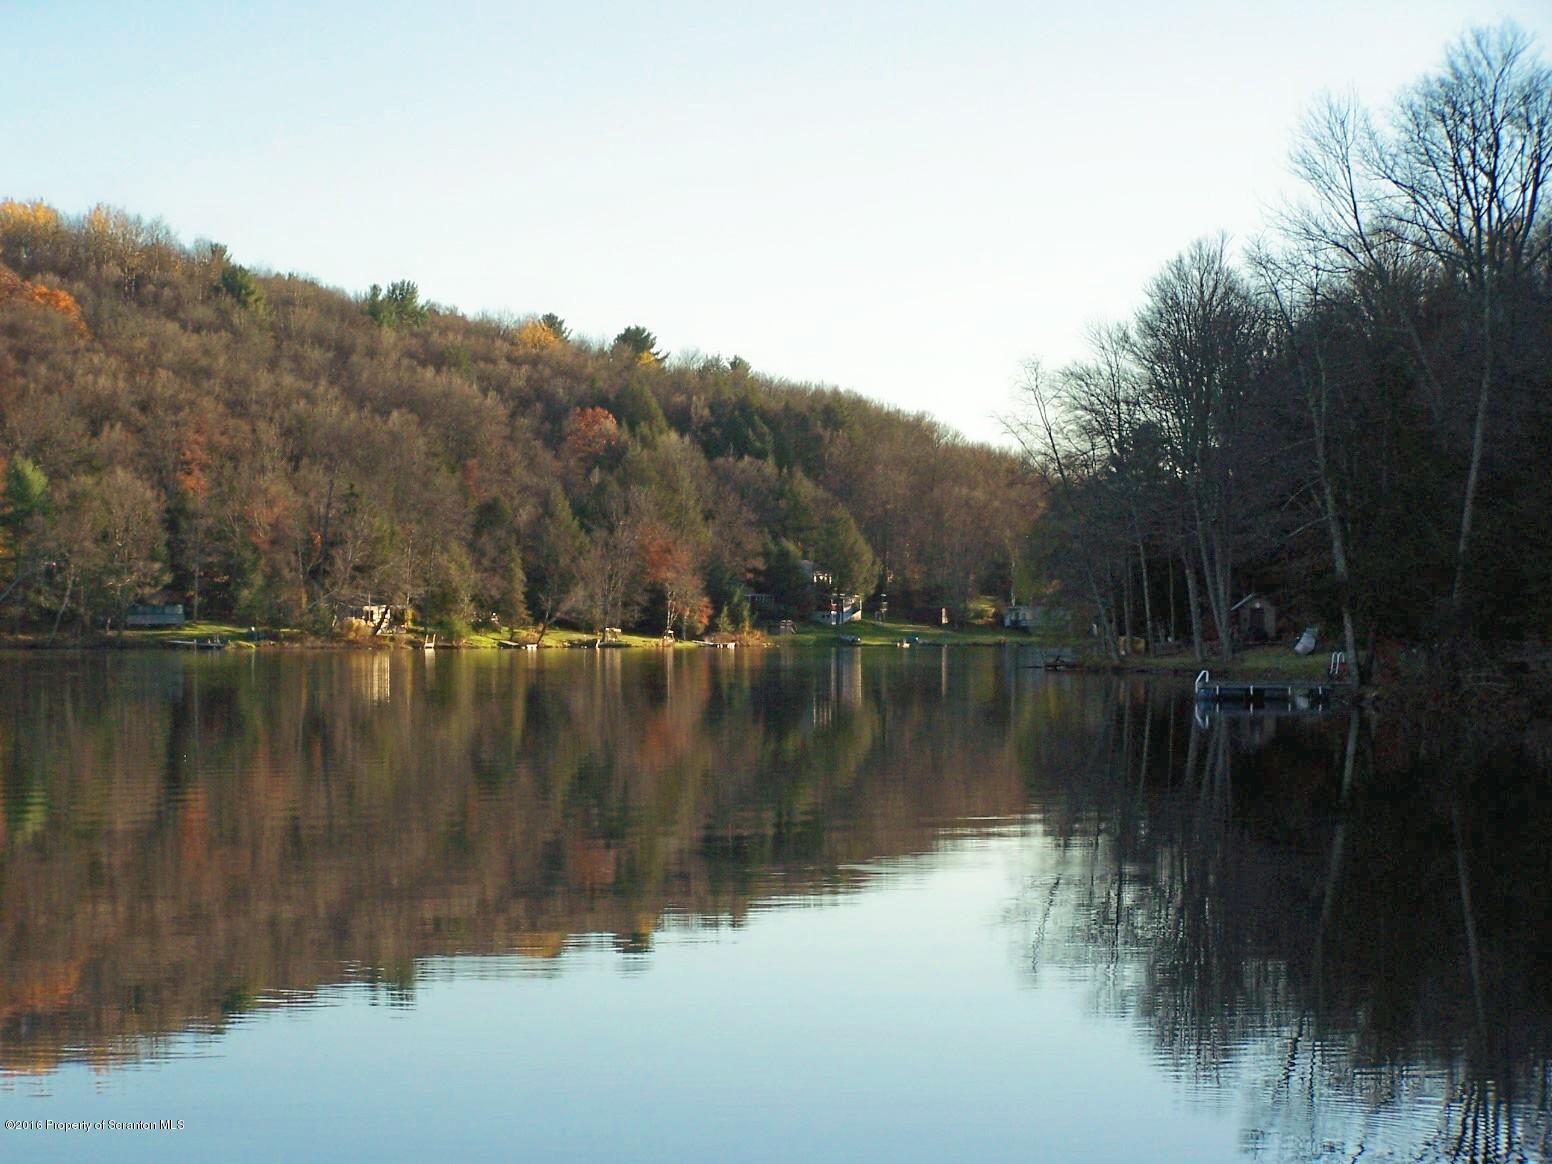 38 Cresent Lake - Lot 3 Crissman, Meshoppen, Pennsylvania 18630, ,Land,For Sale,Cresent Lake - Lot 3 Crissman,16-922